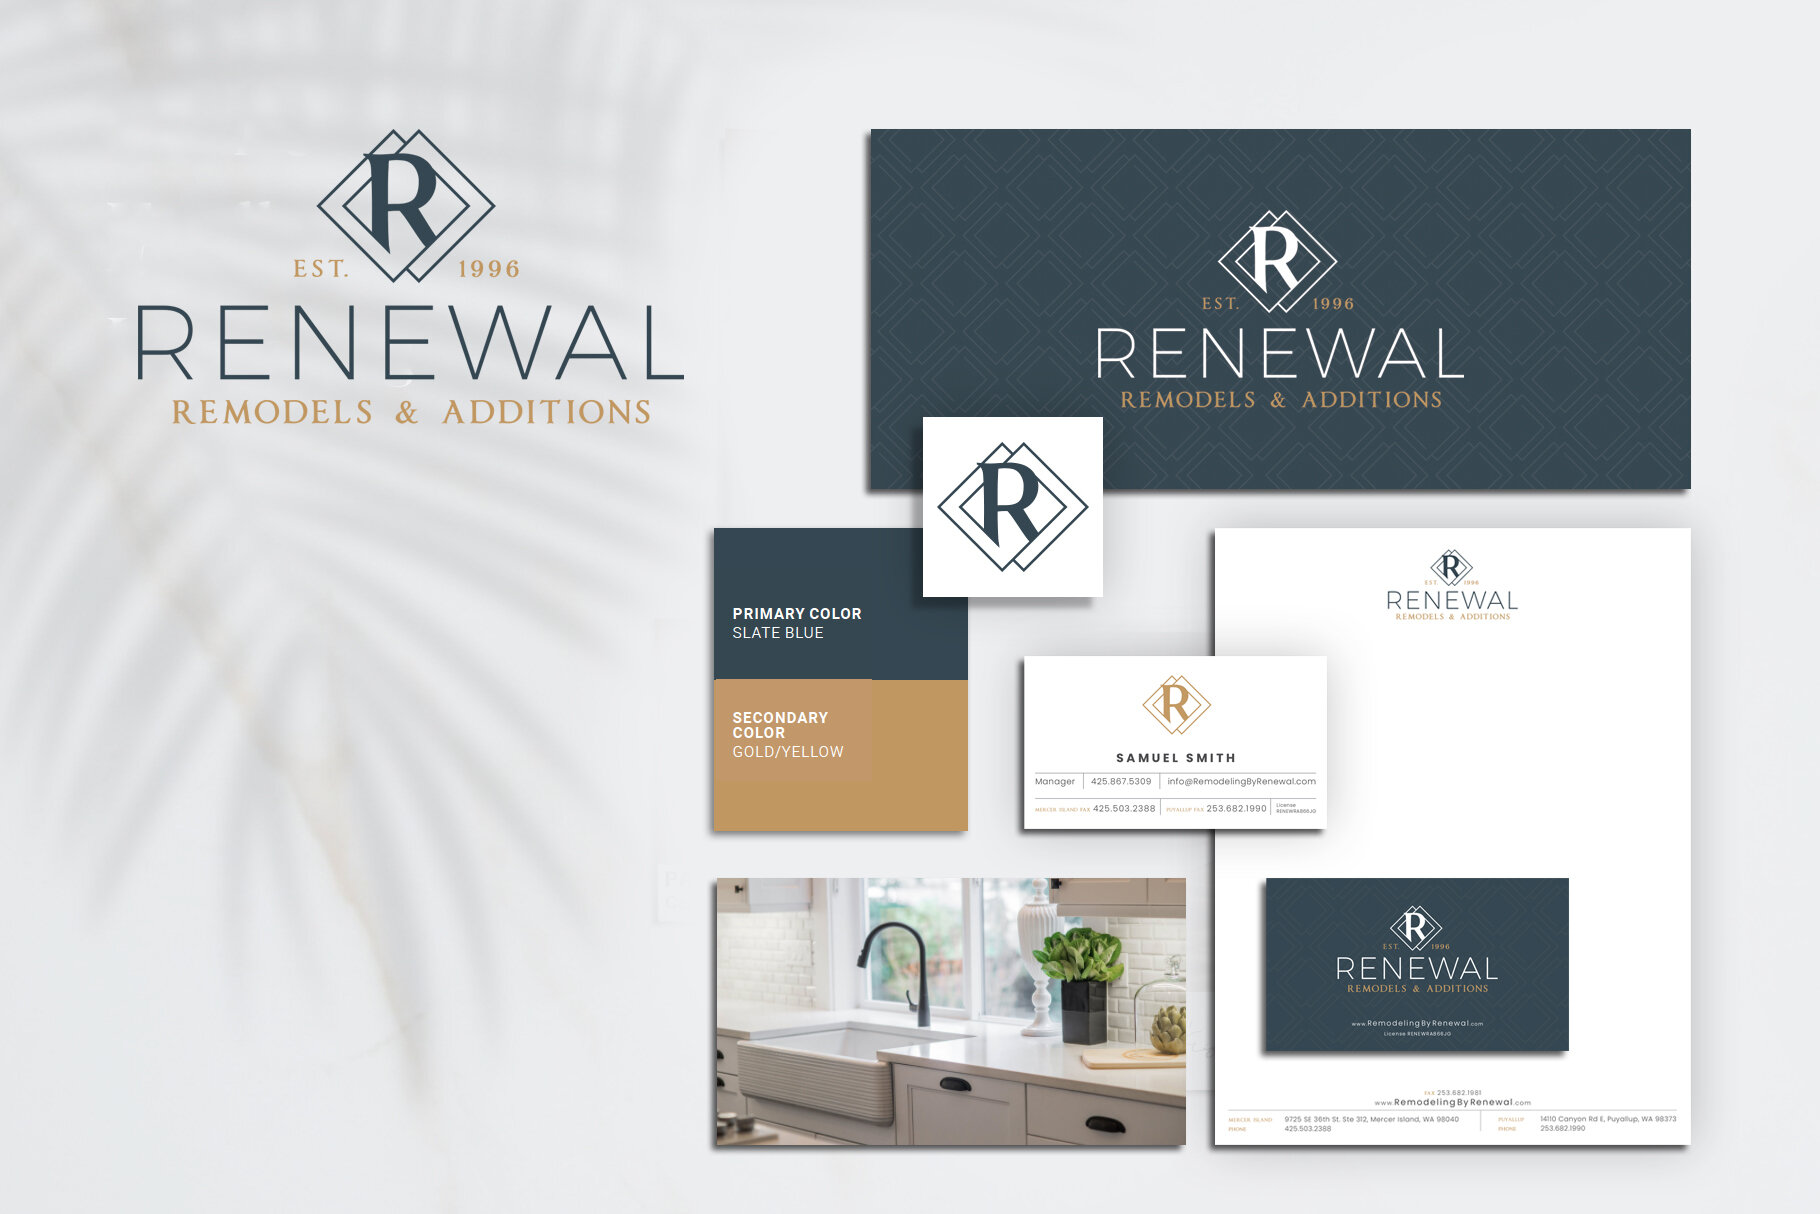 Renewal_logo_moodboard_v1.jpg